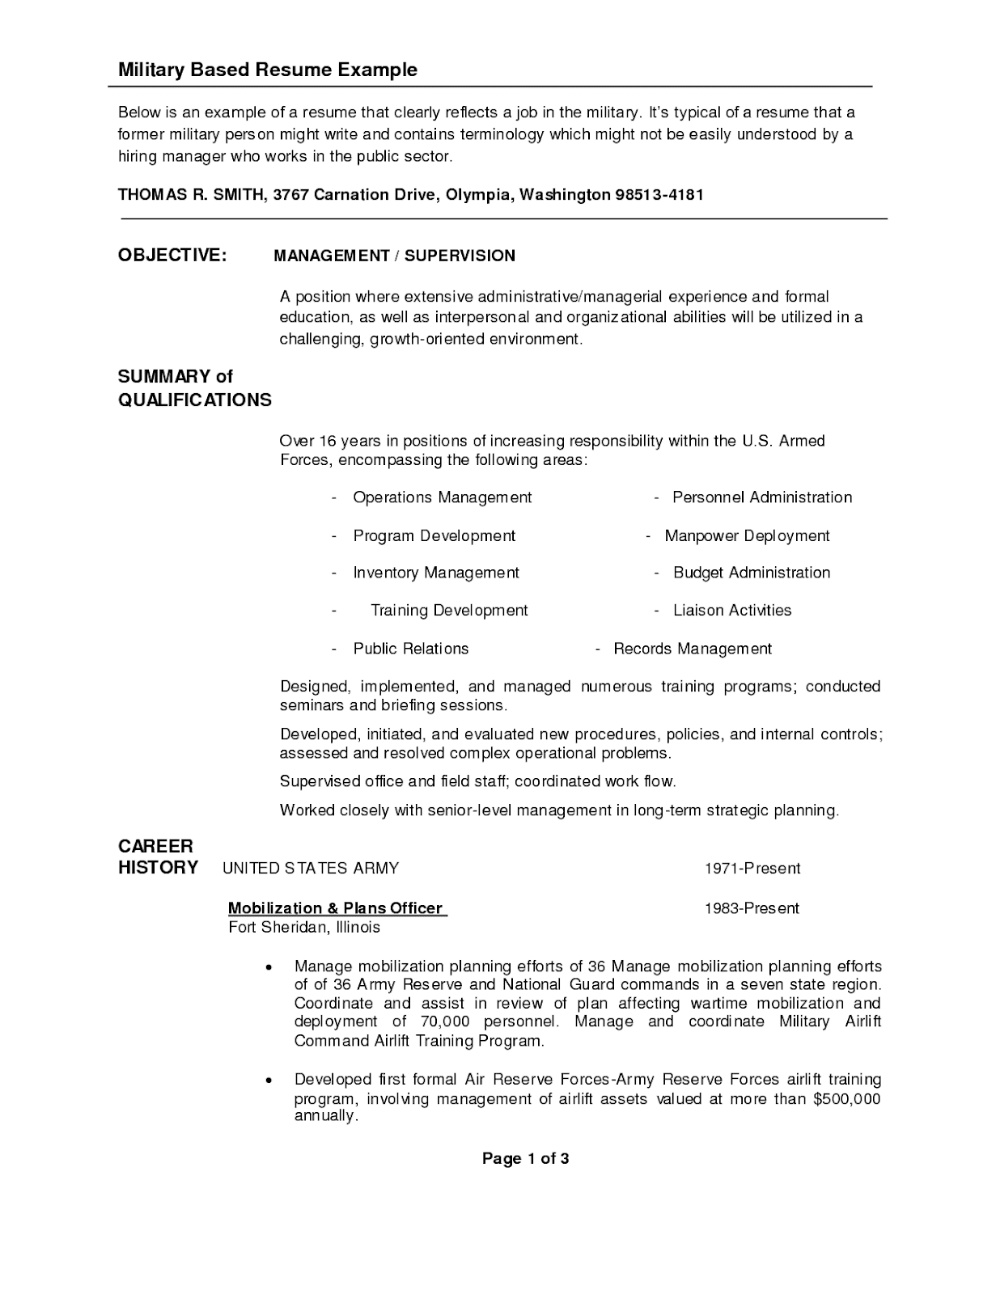 Security Guard Resume Template 2019 2020 Security Guard Resume Template 2019 Security Guard Res Resume Examples Job Resume Examples Resume Writing Examples